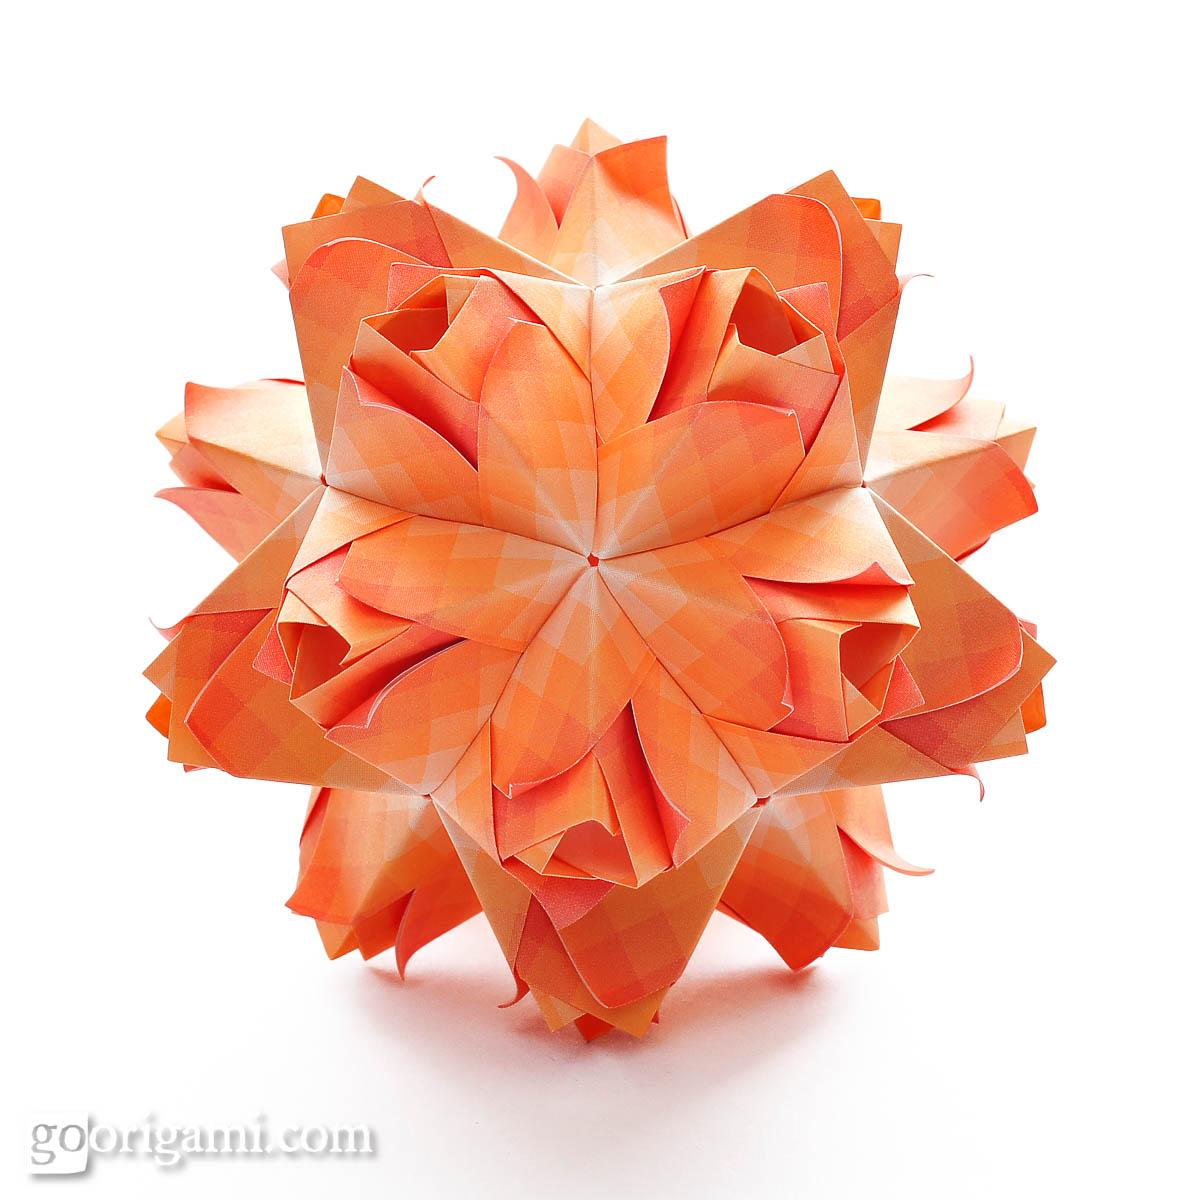 origami hummingbird diagram instructions infrastructure visio caramel kusudama by maria sinayskaya  go